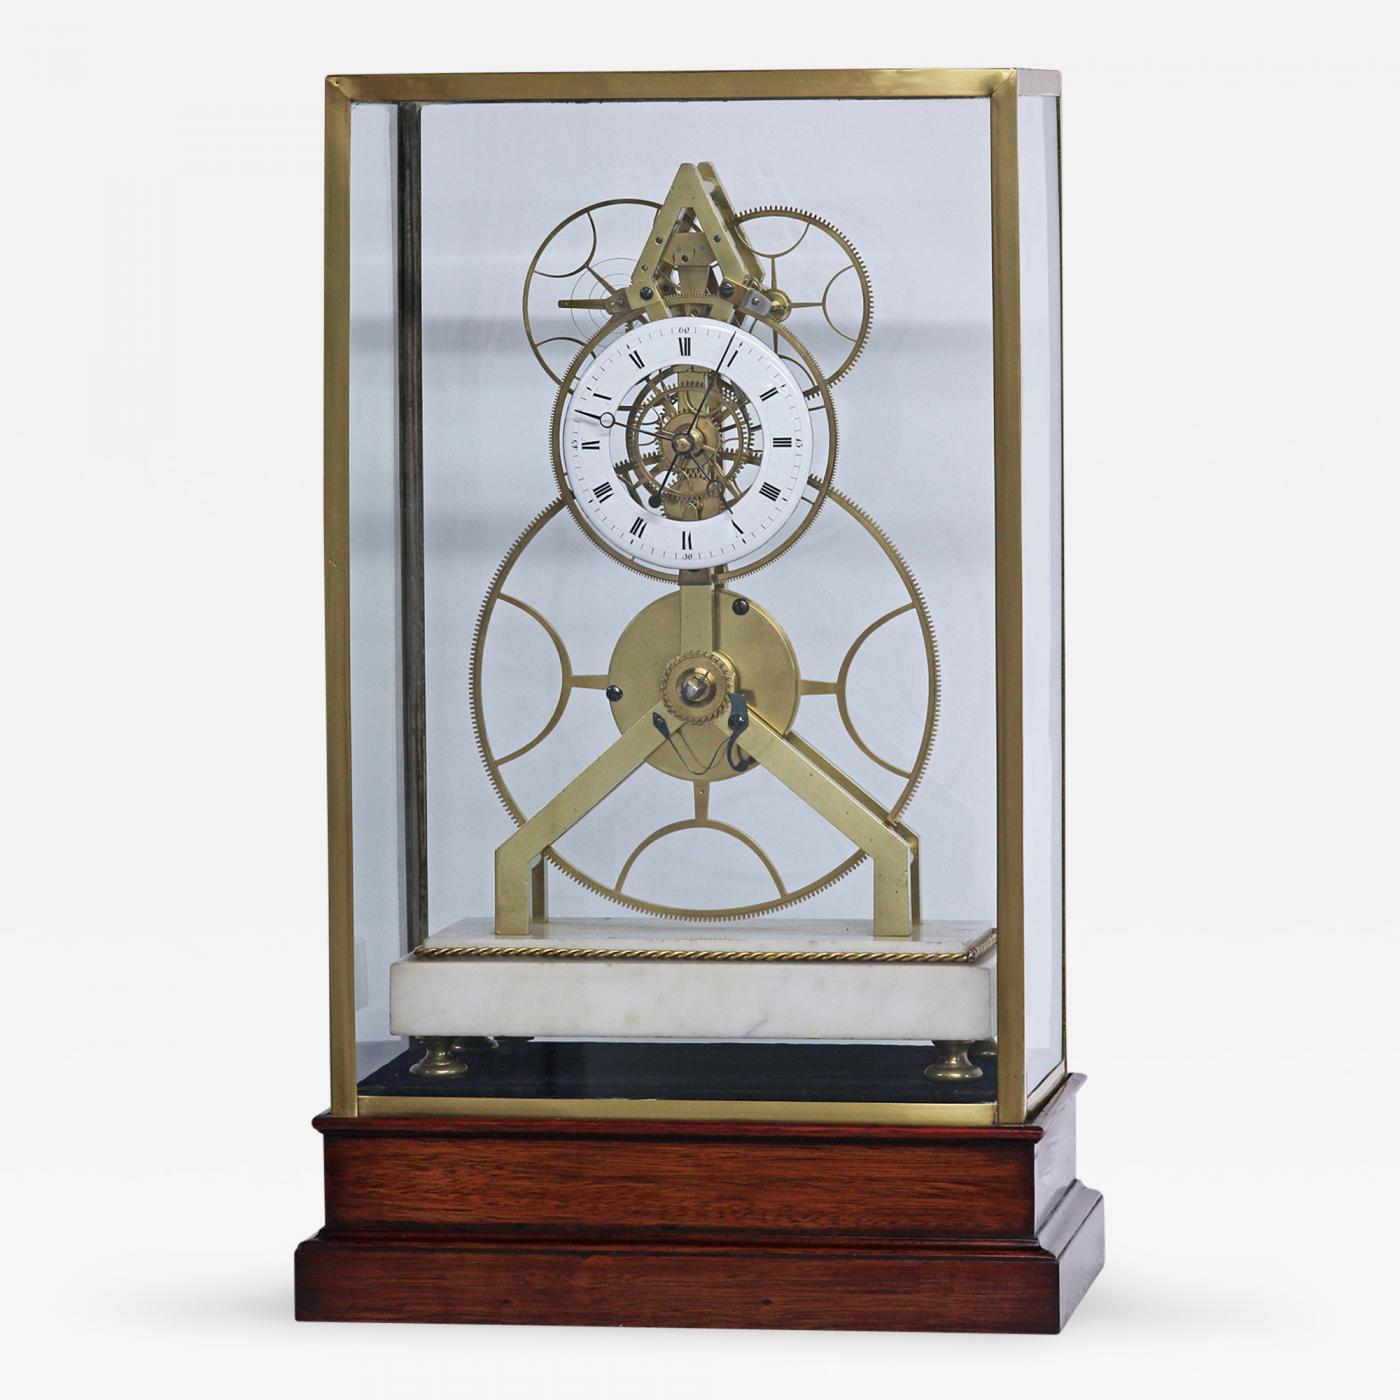 1815 rare french great wheel skeleton clock with balance wheel